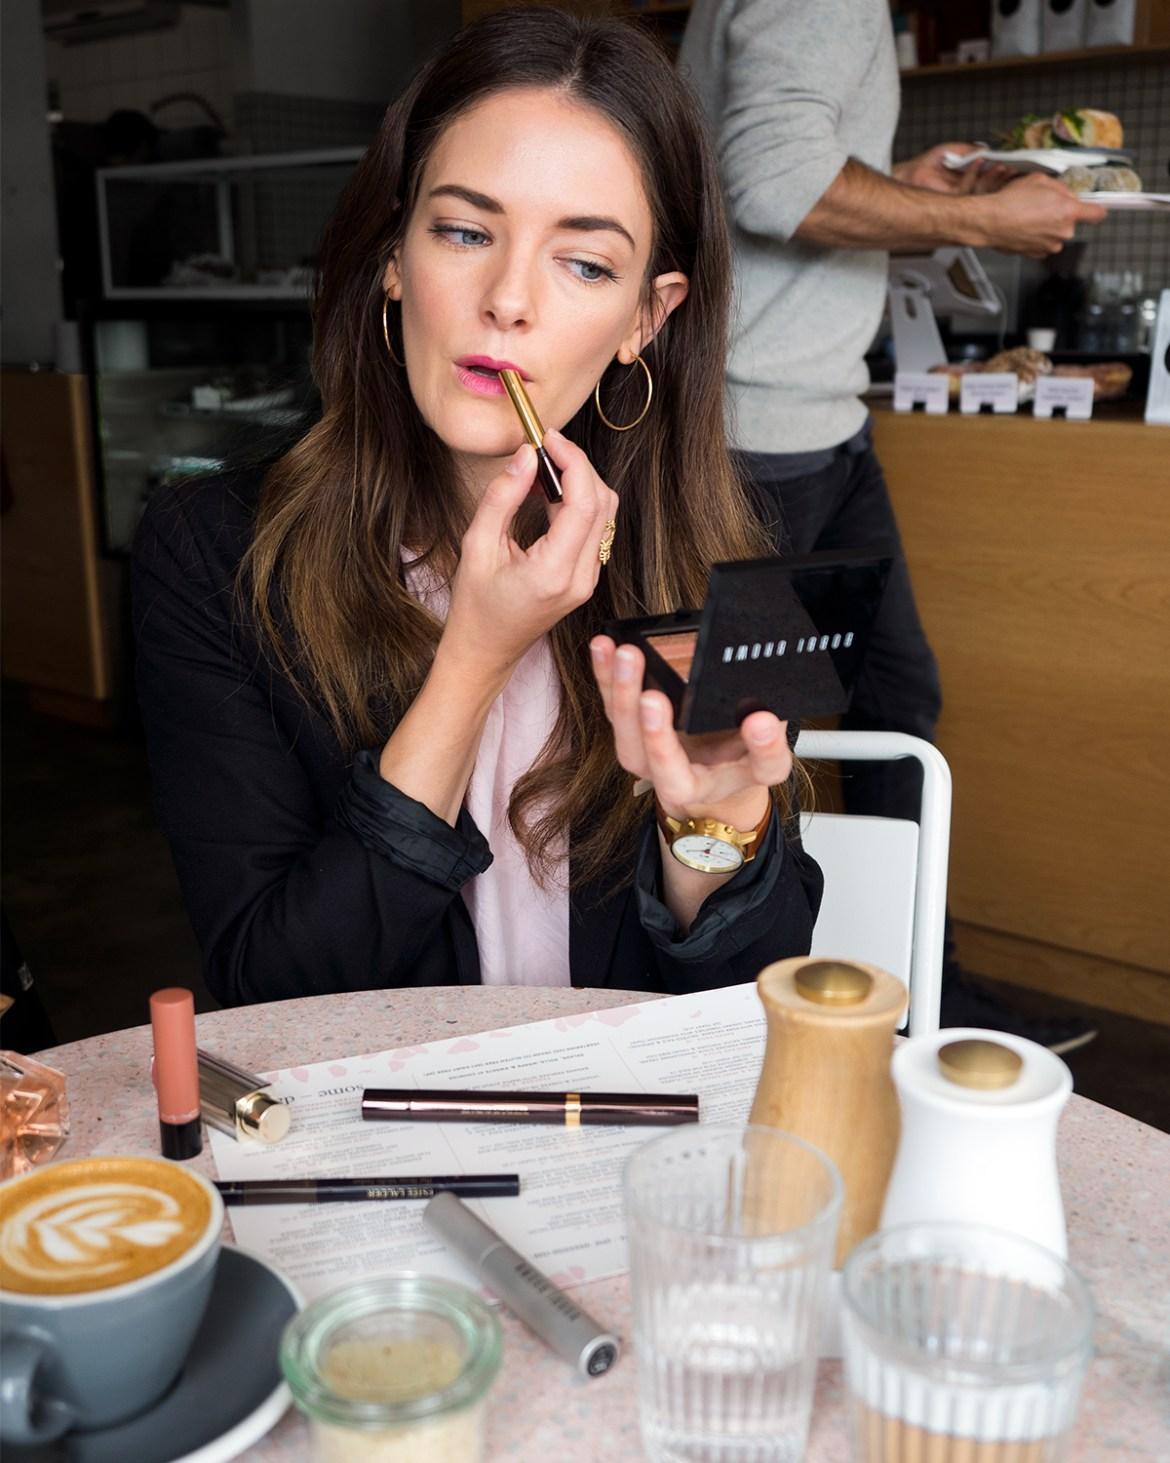 Winter beauty edit by Australian beauty blogger Inspiring Wit featuring Bobbi Brown